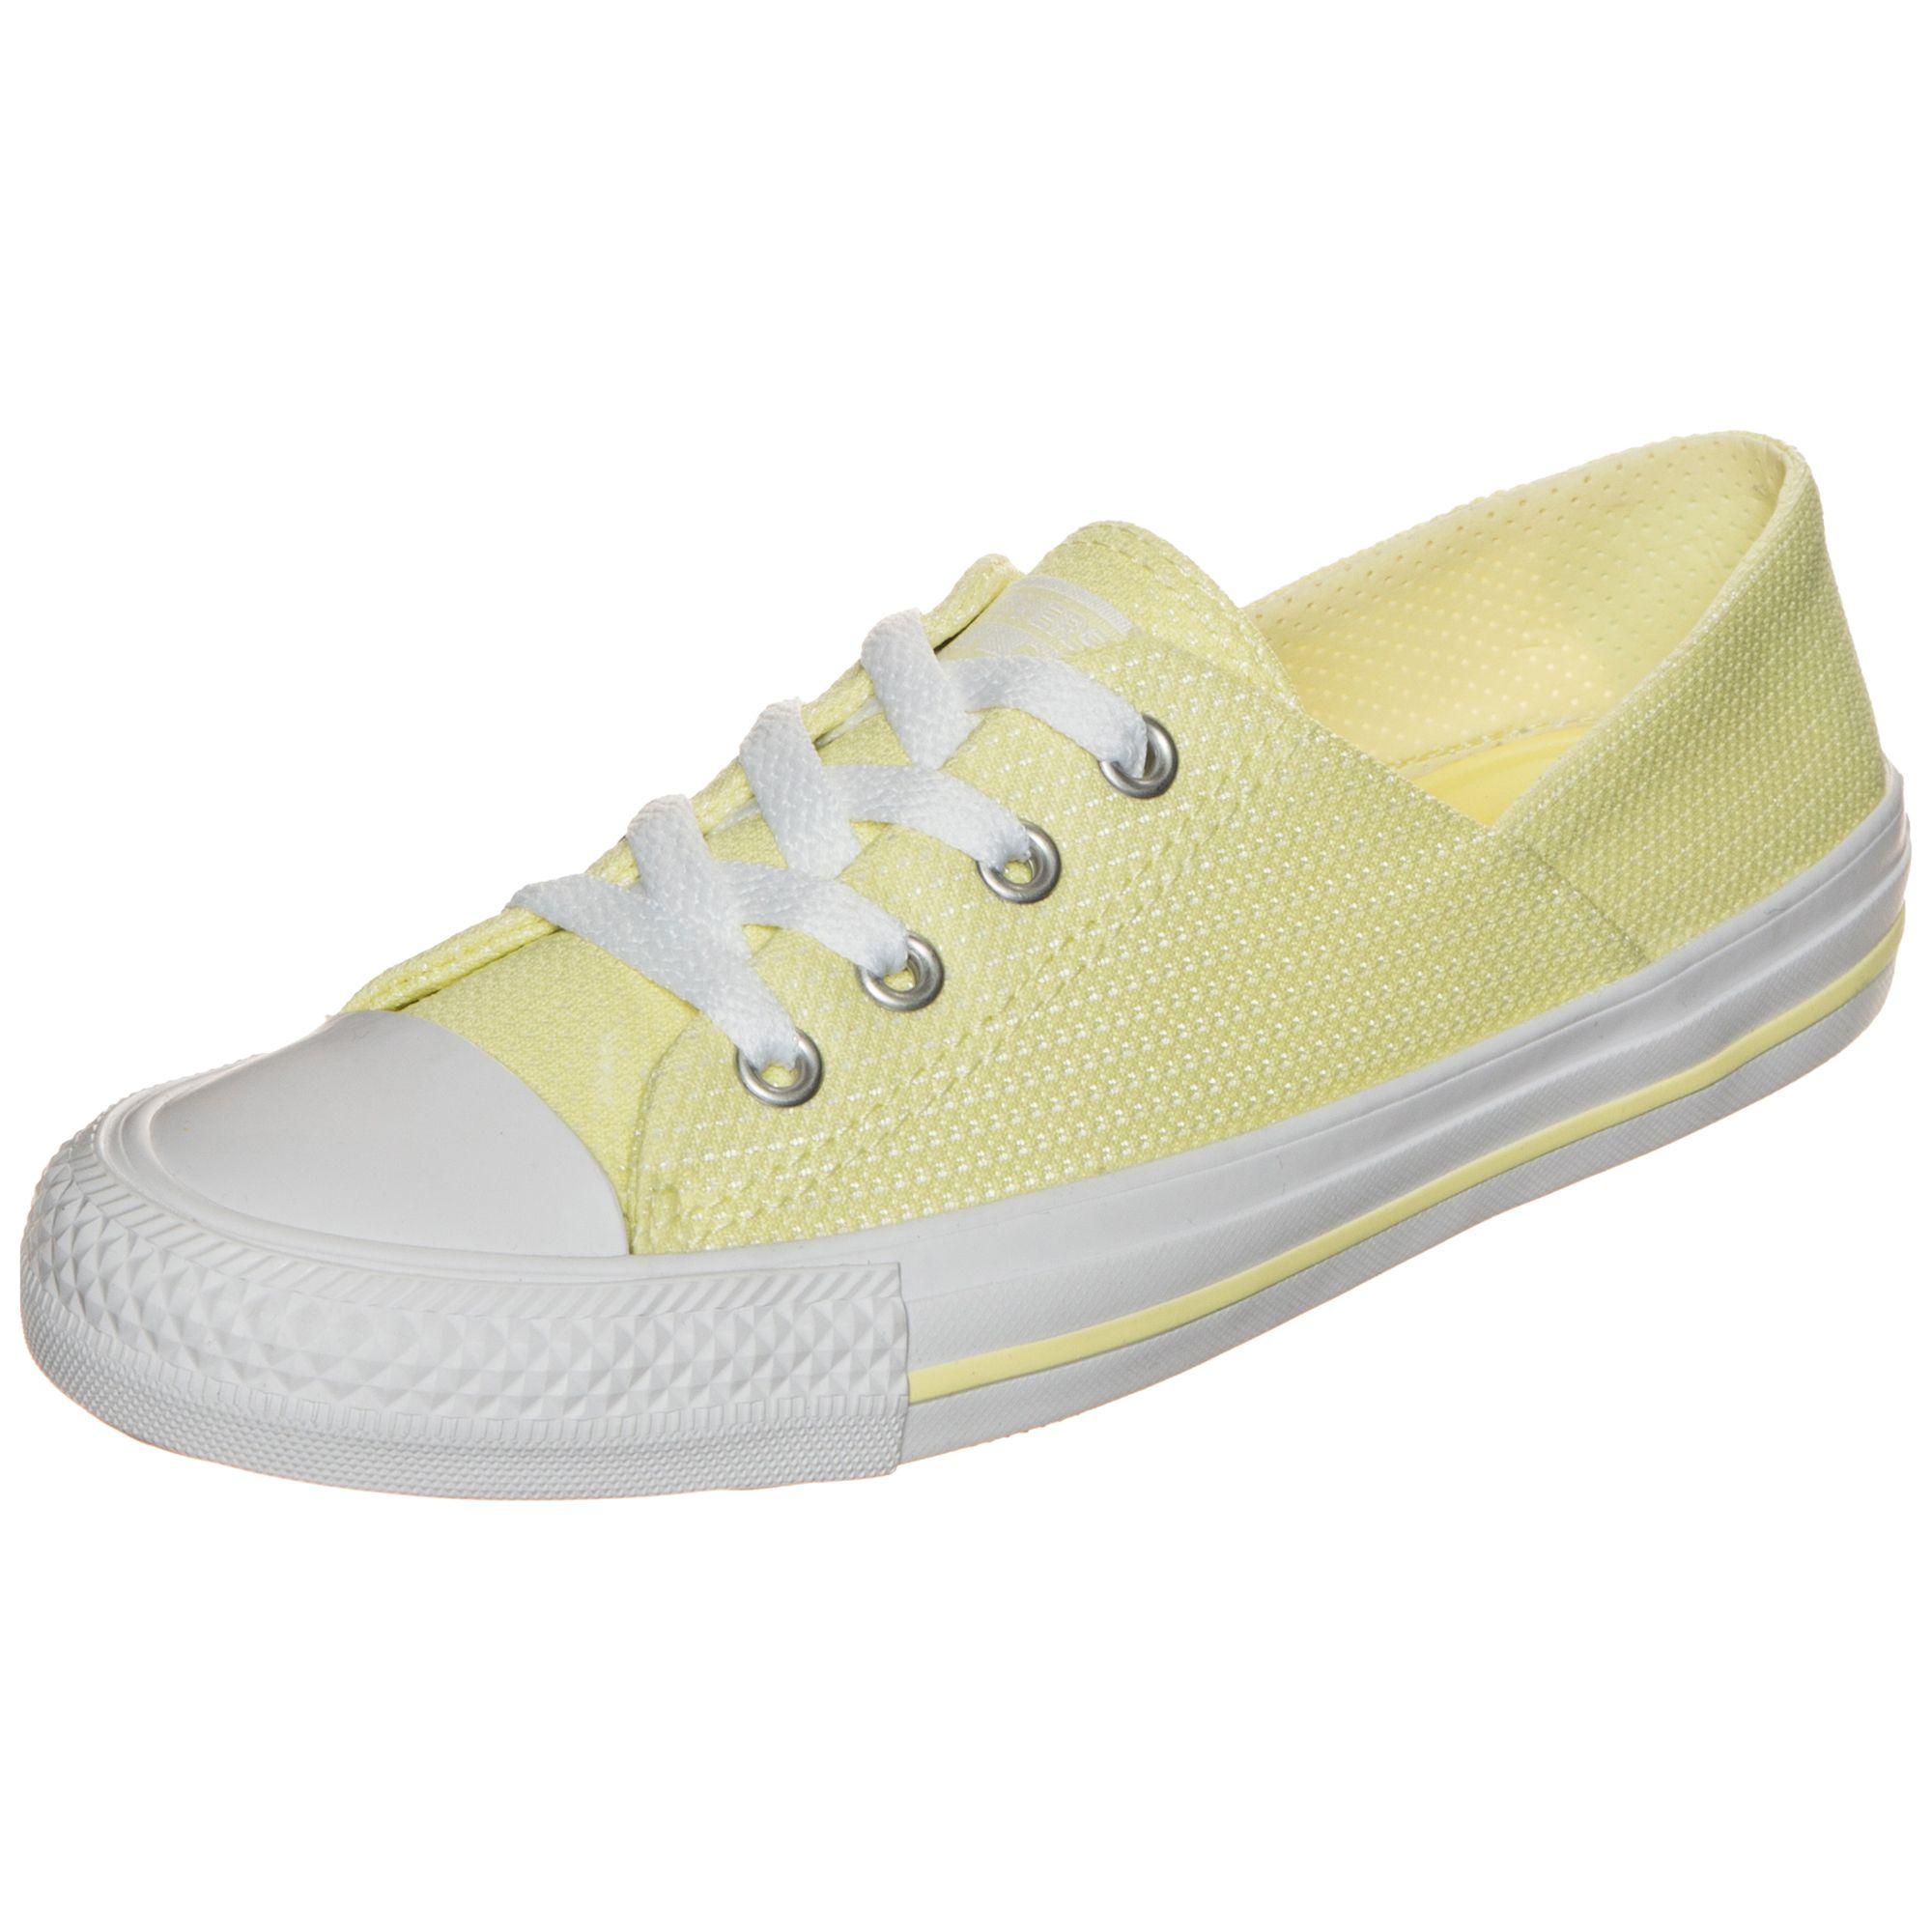 CONVERSE Converse Chuck Taylor All Star Coral Micro Dot Knit OX Sneaker Damen